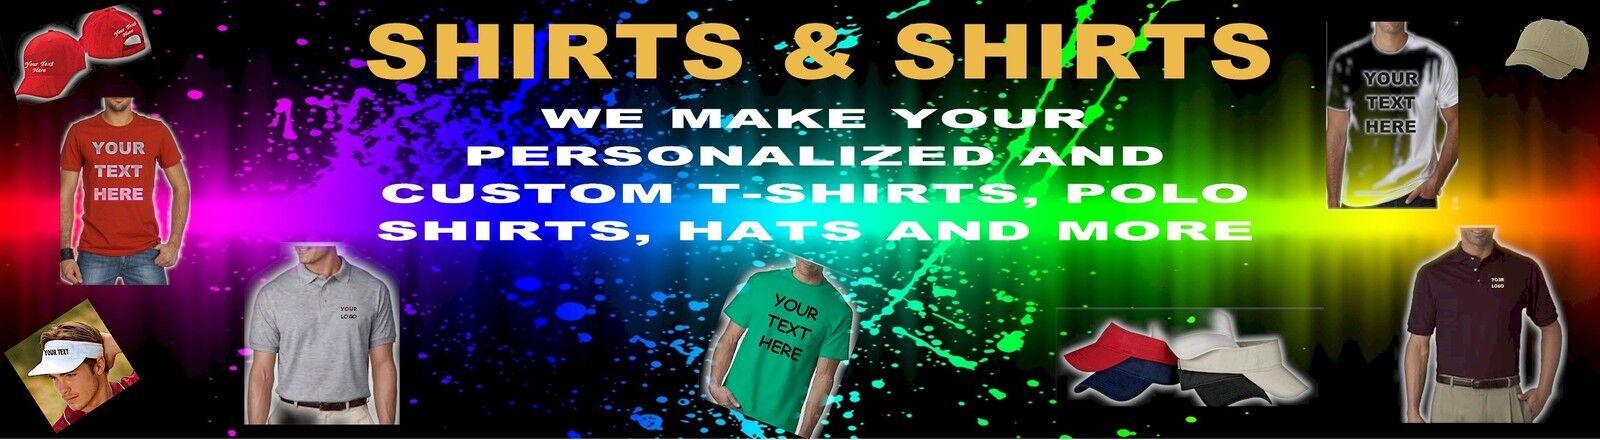 Shirts & Shirts